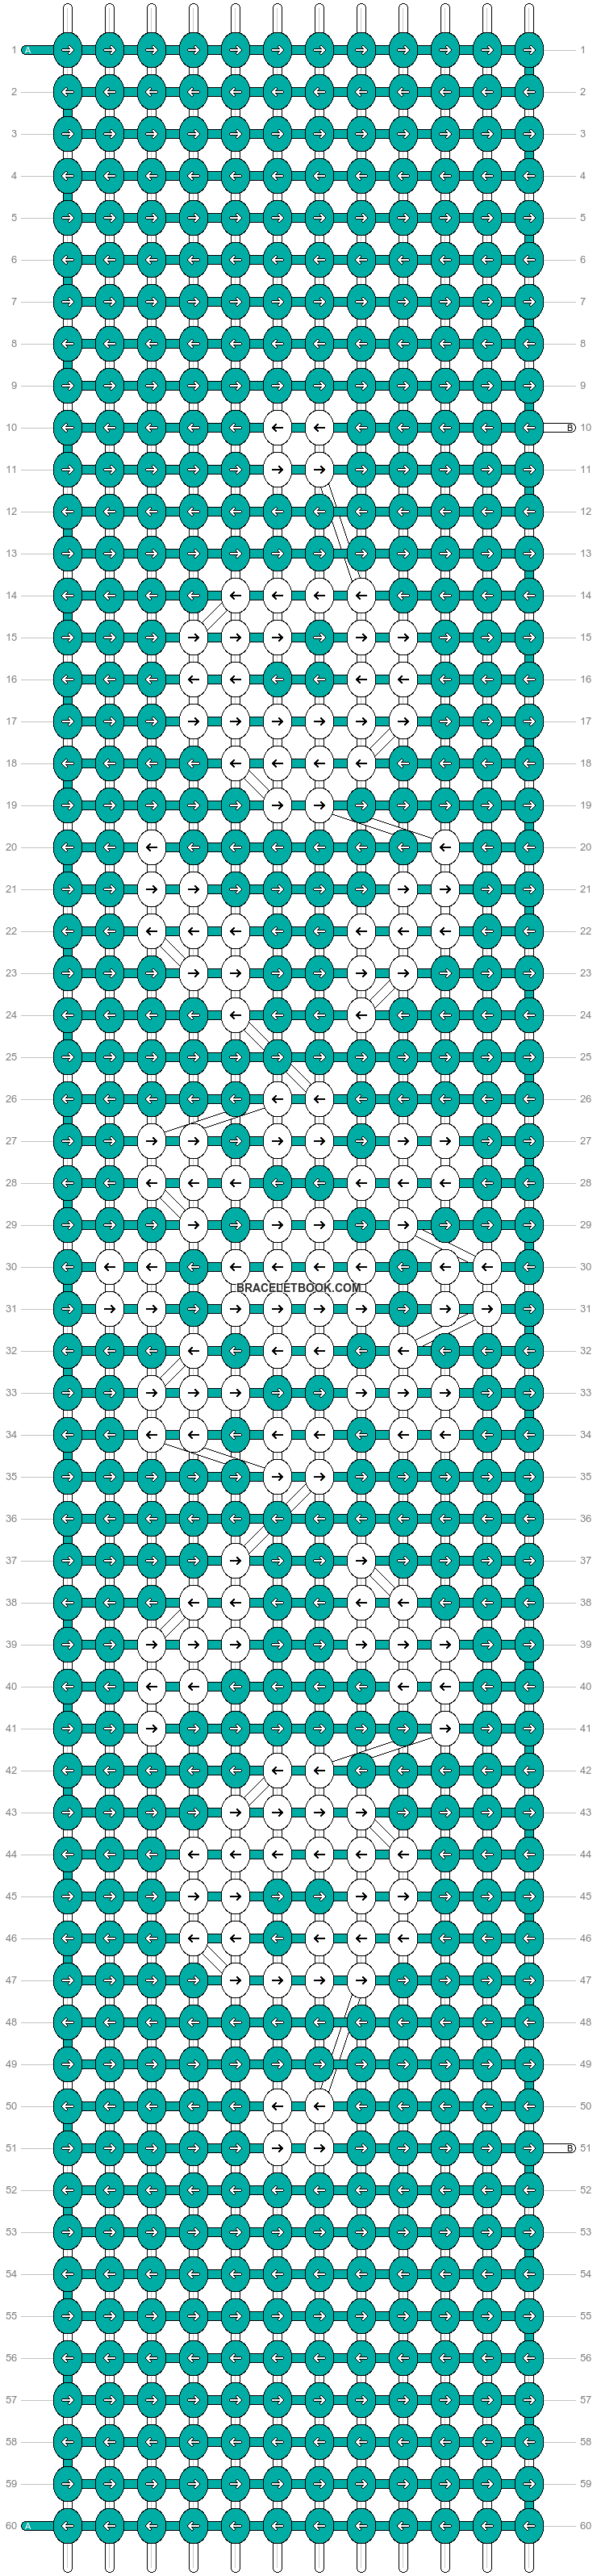 Alpha pattern #80293 pattern